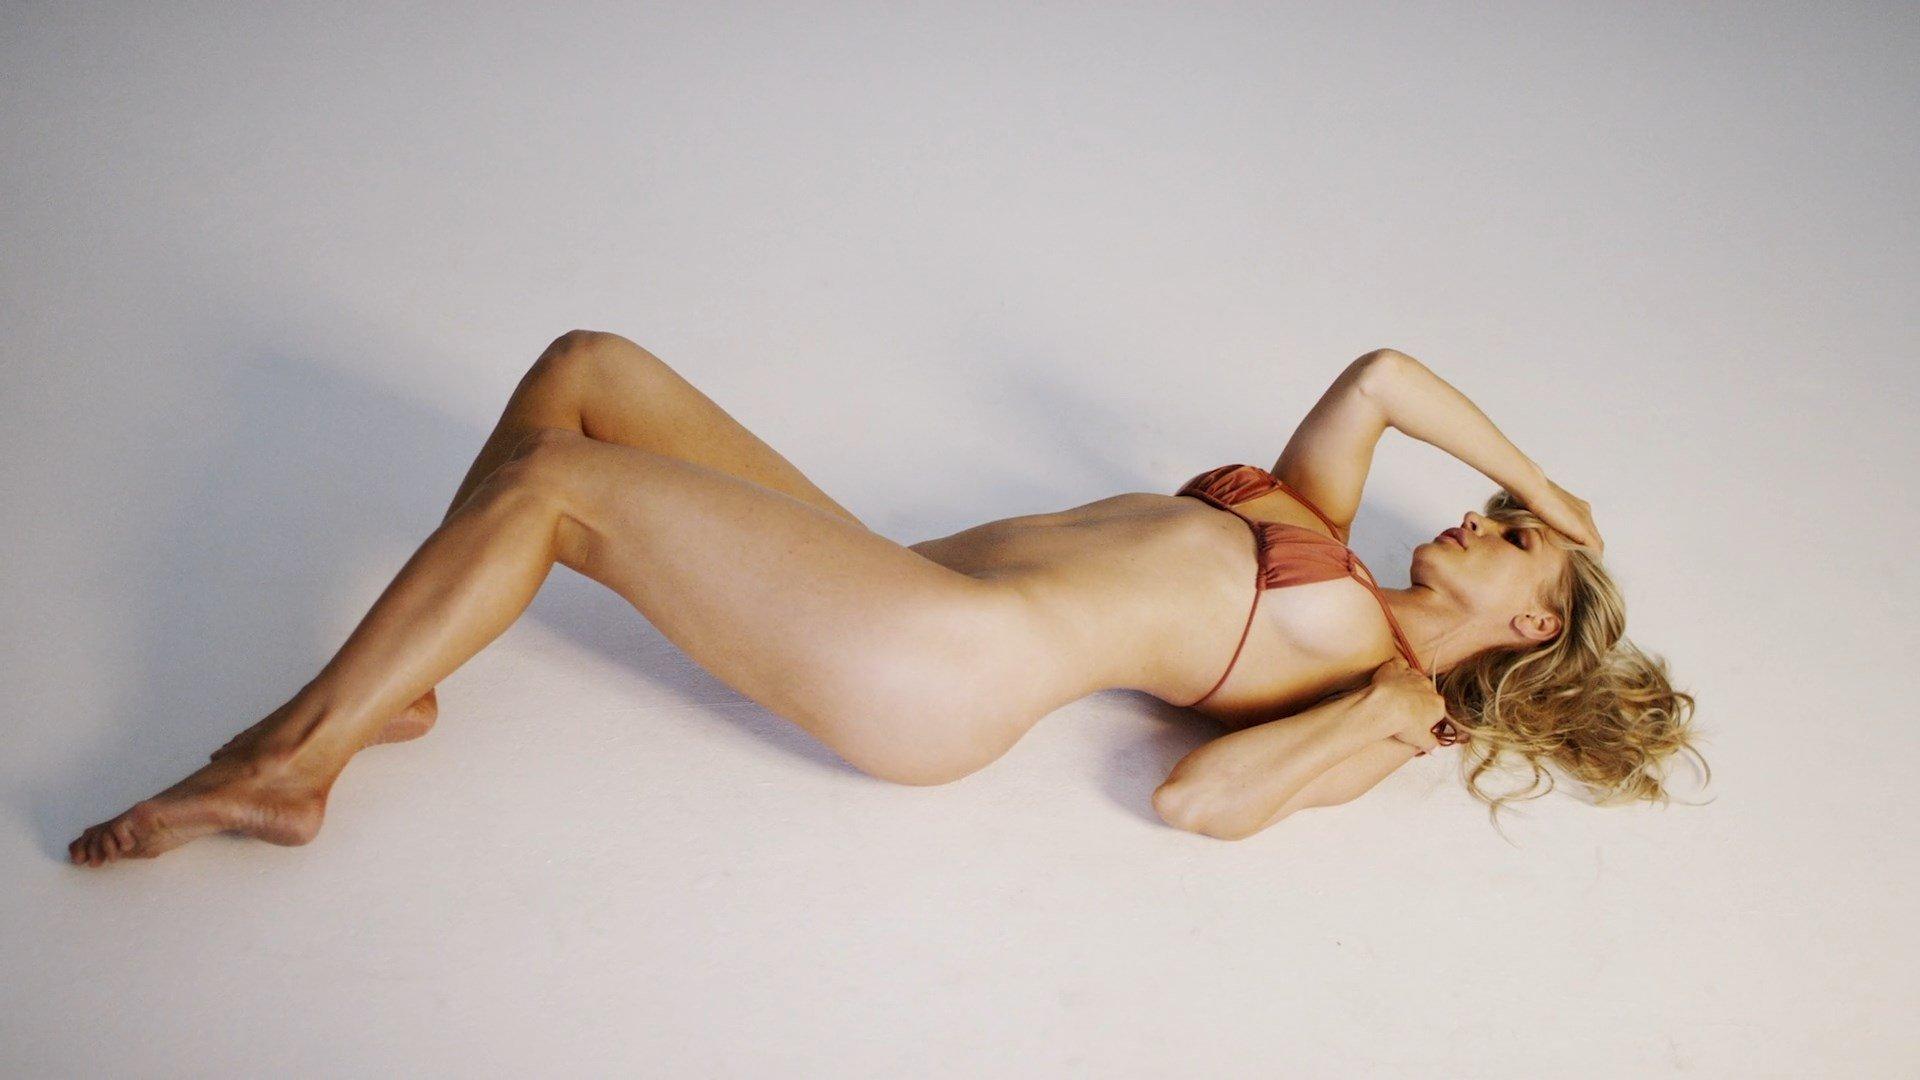 asian nude women video windows media